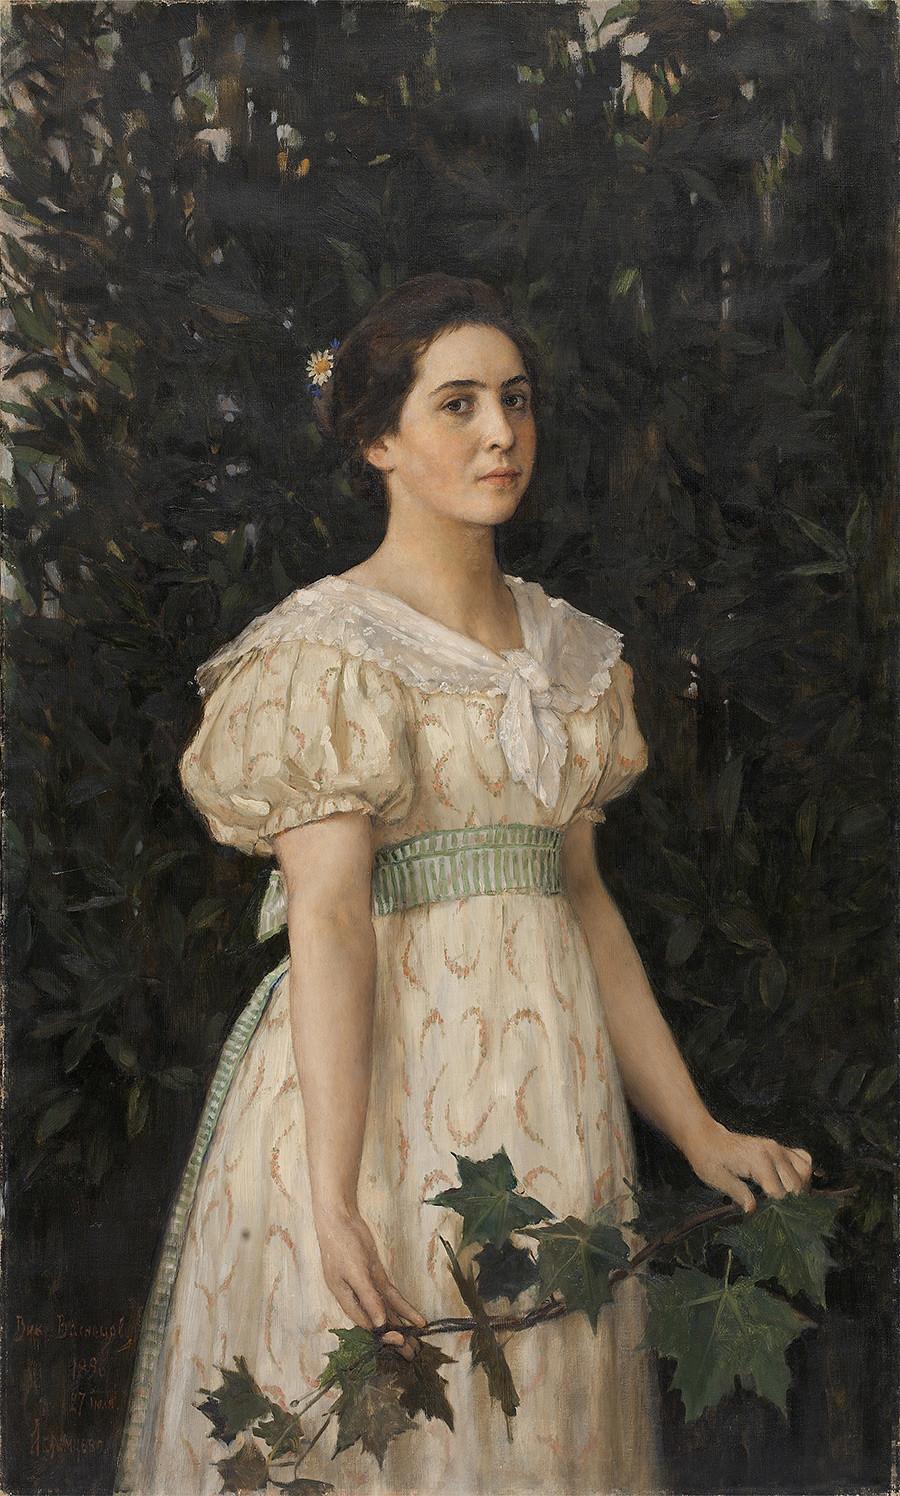 'Girl with a maple branch' (1886), a portrait of Vera Mamontova by Viktor Vasnetsov